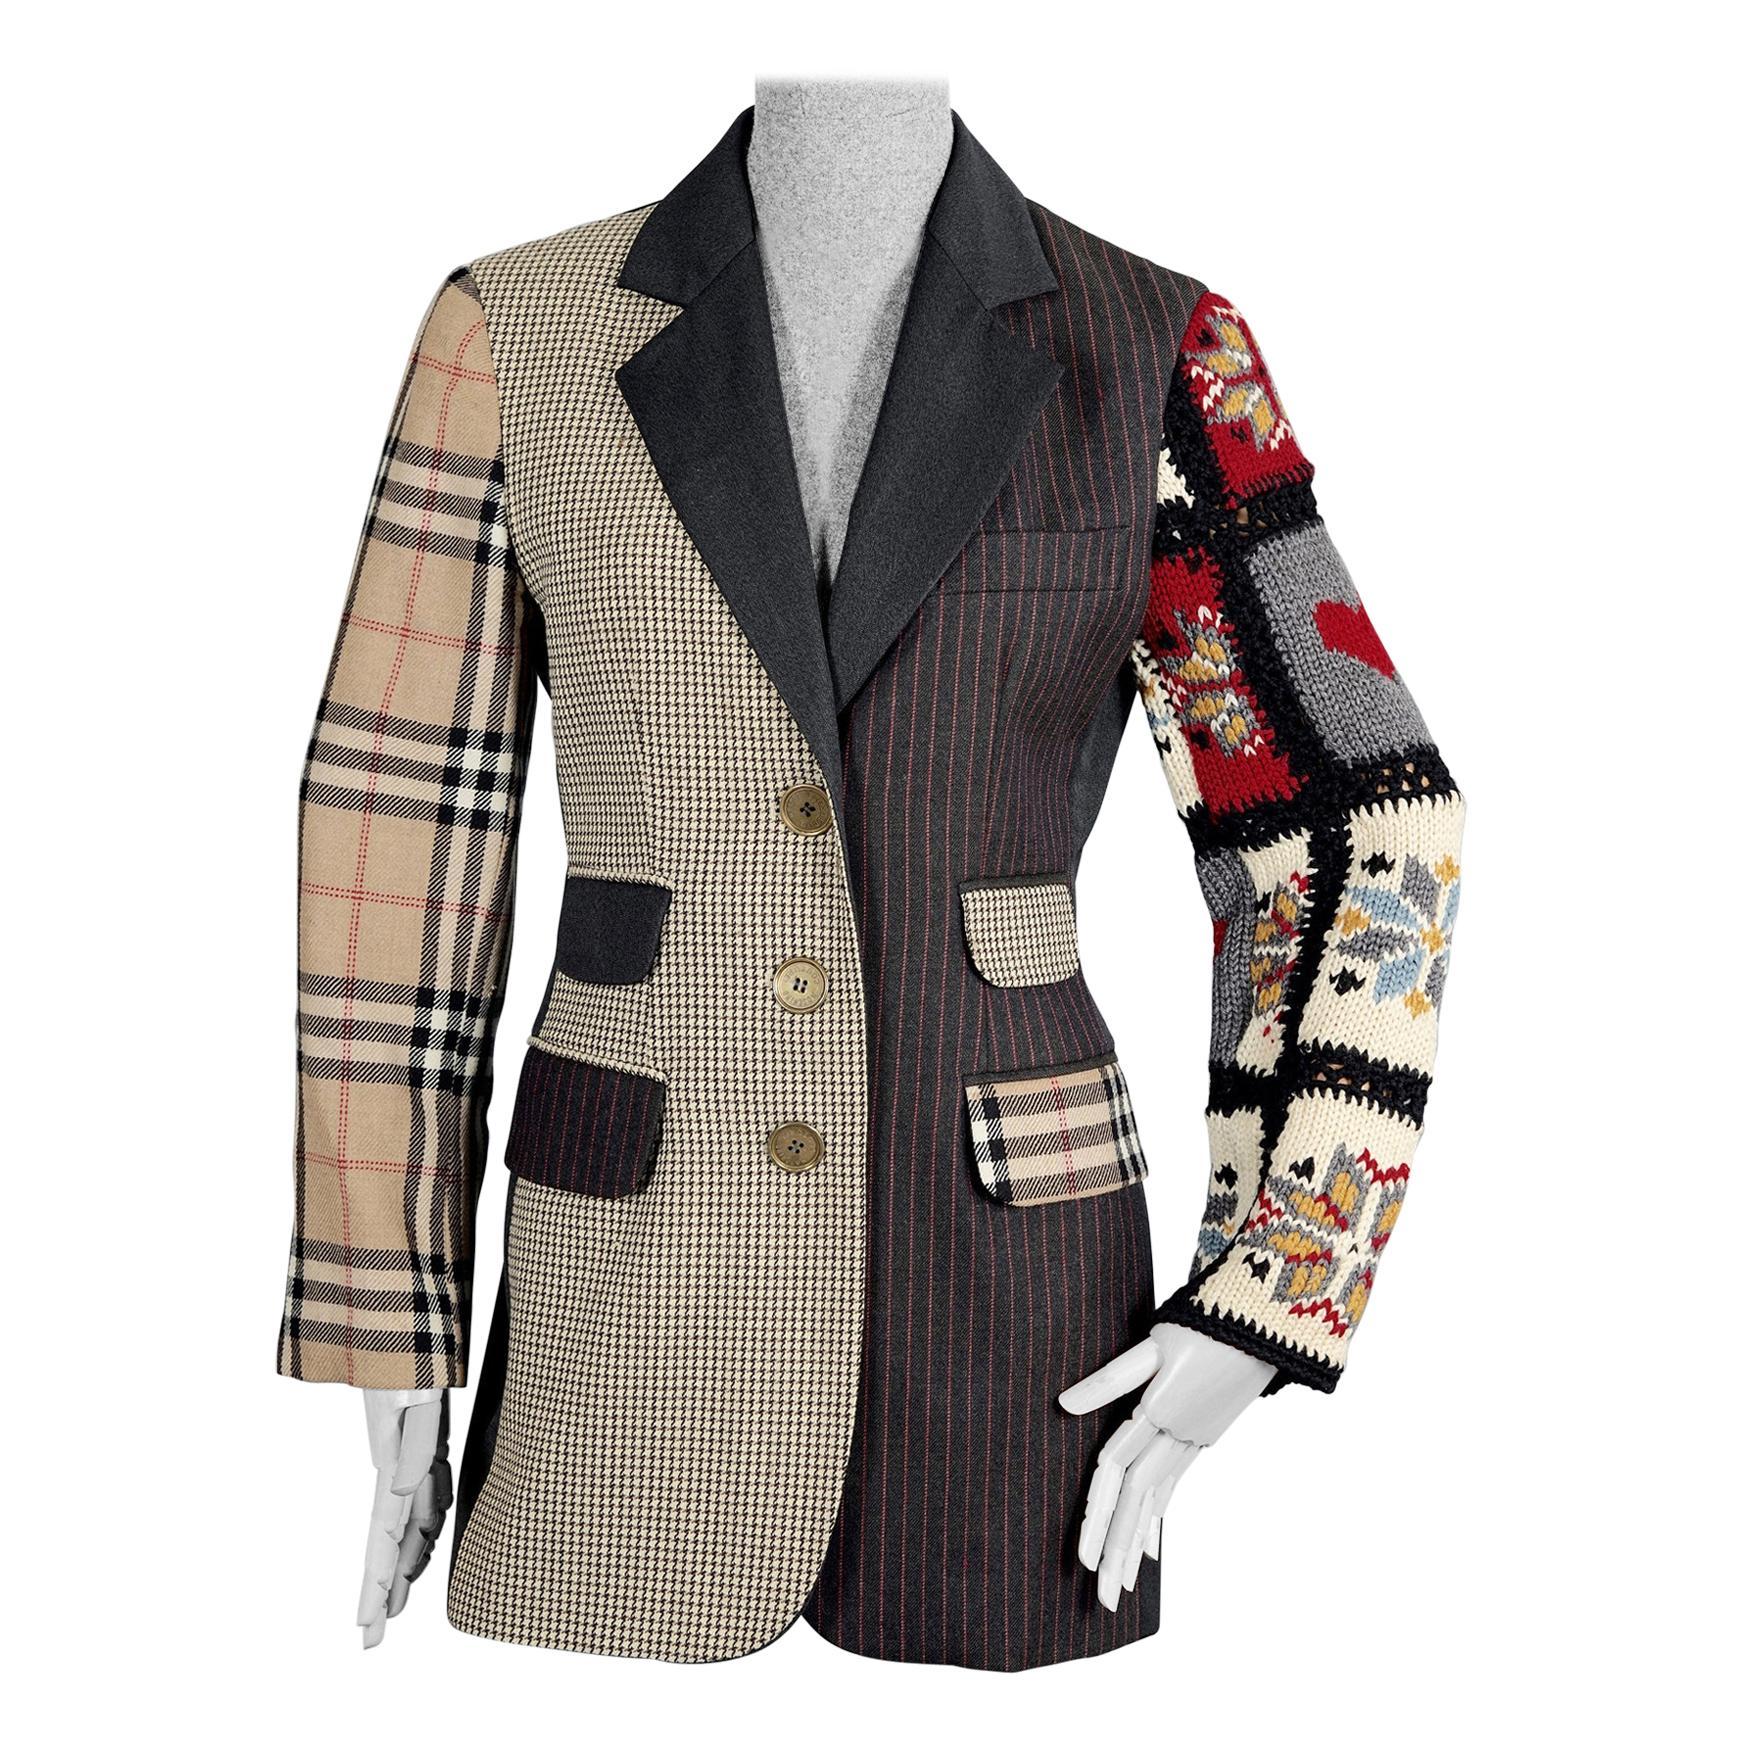 Vintage MOSCHINO COUTURE Patchwork Novelty Blazer Jacket